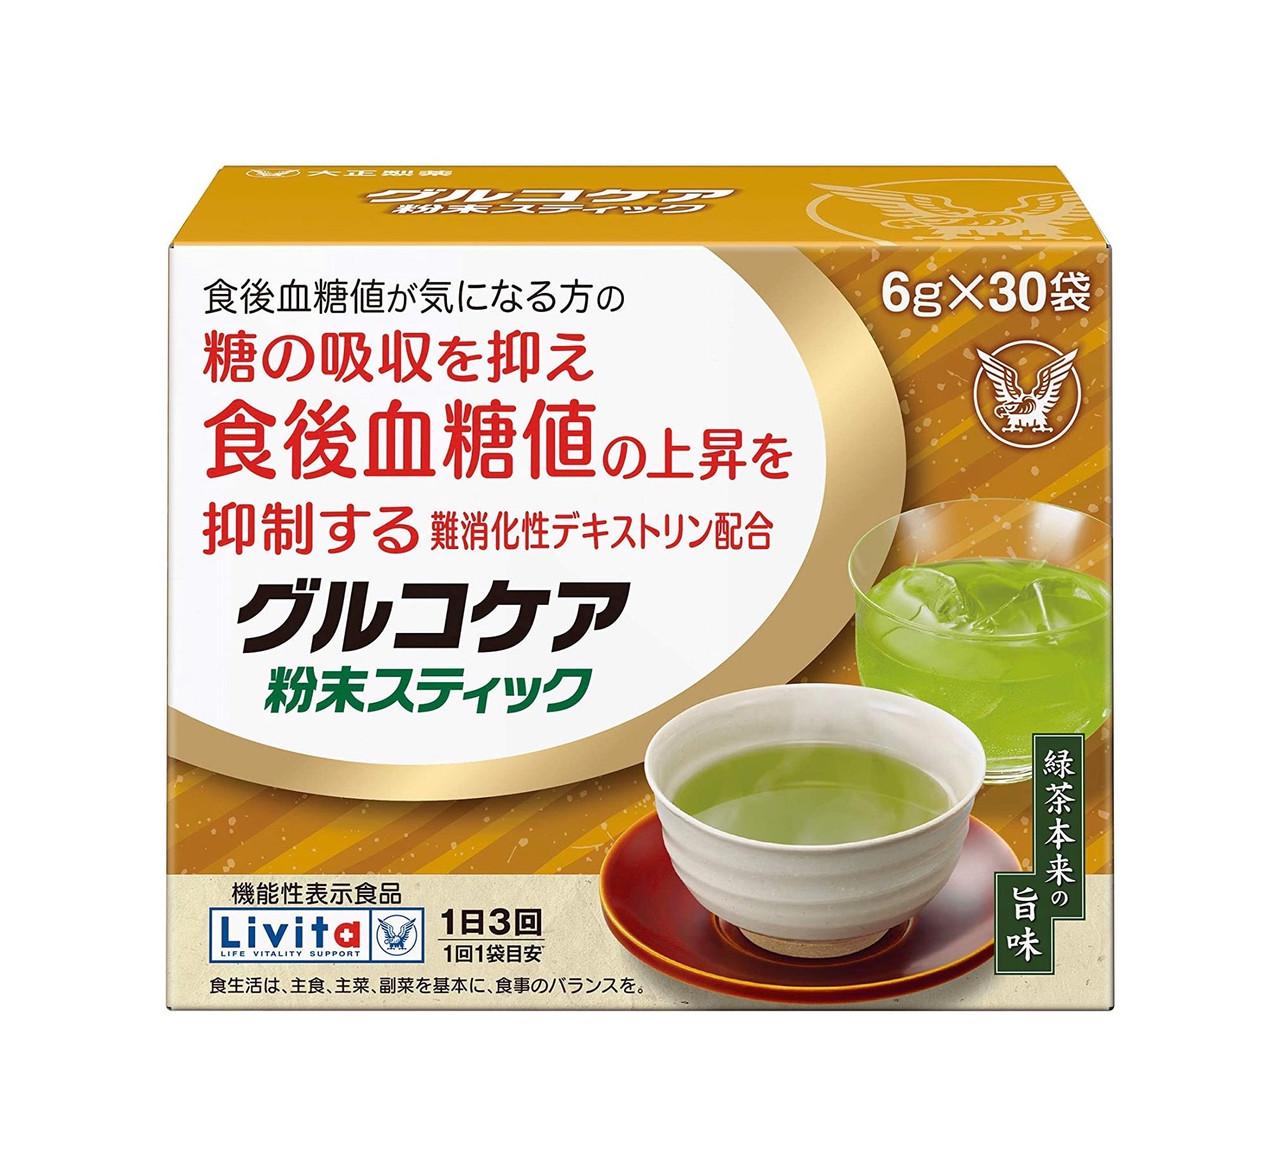 Livita Glucocare Зеленый чай от повышения сахара